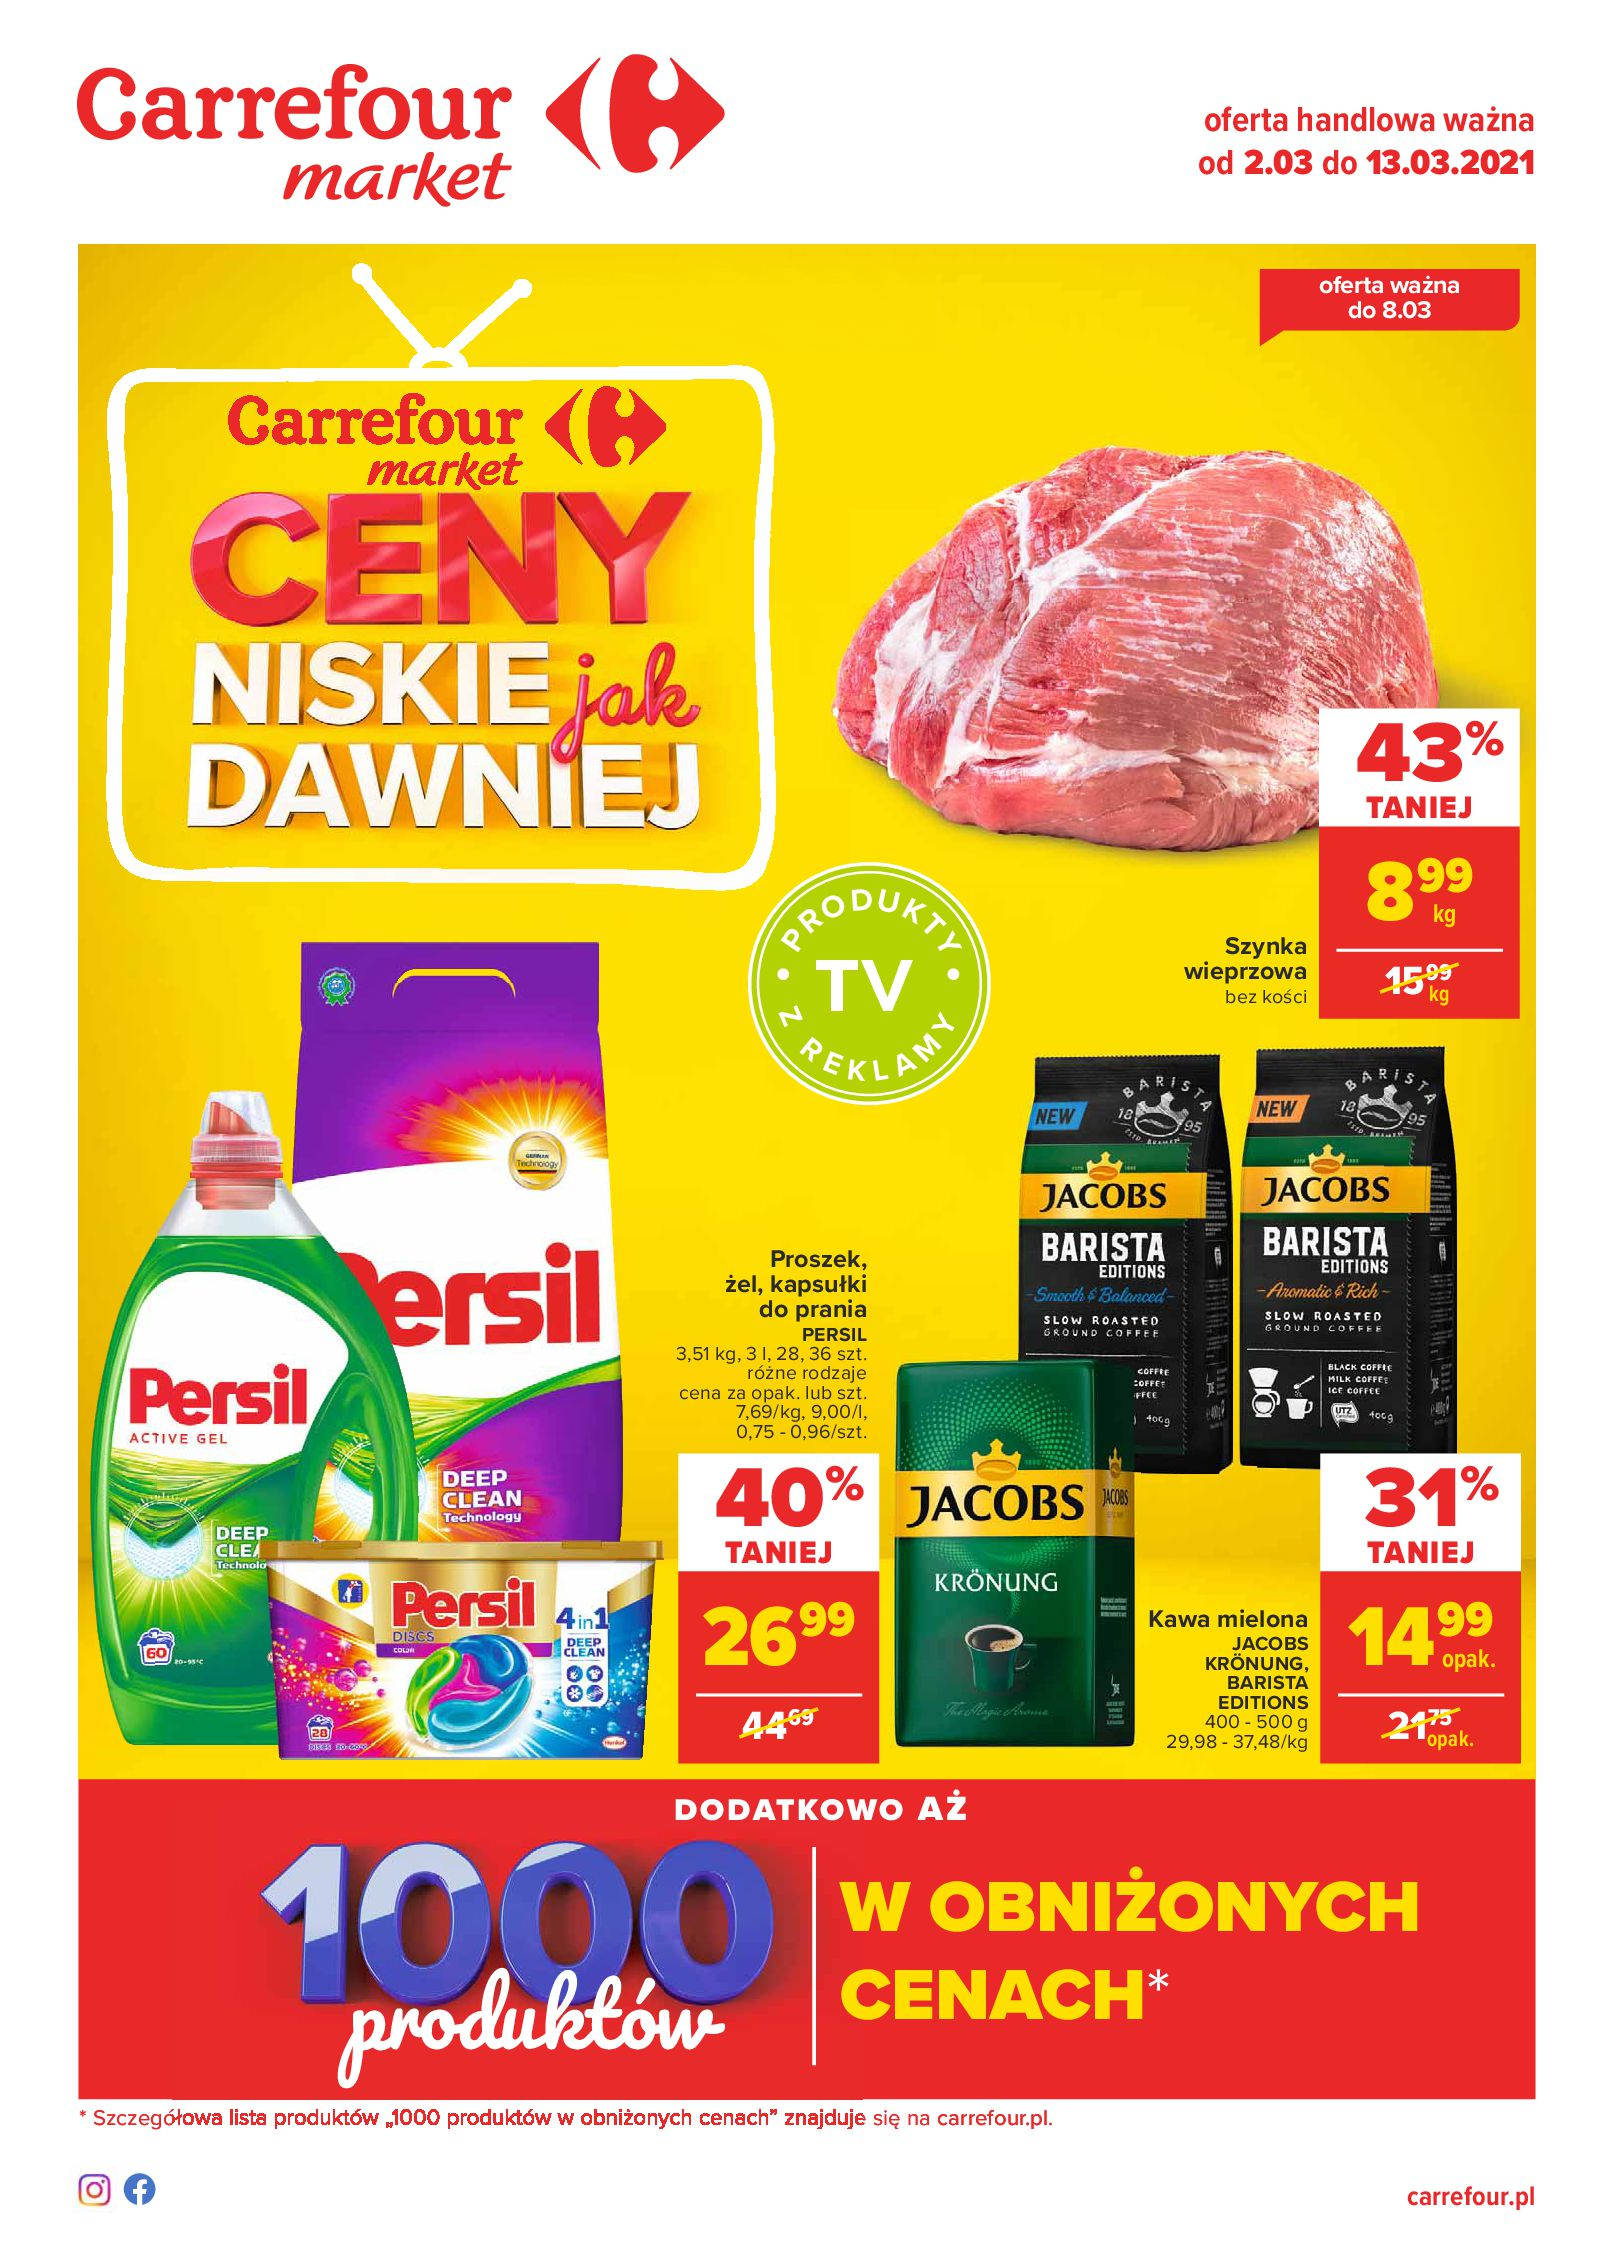 Carrefour Market:  Gazetka Market 01.03.2021